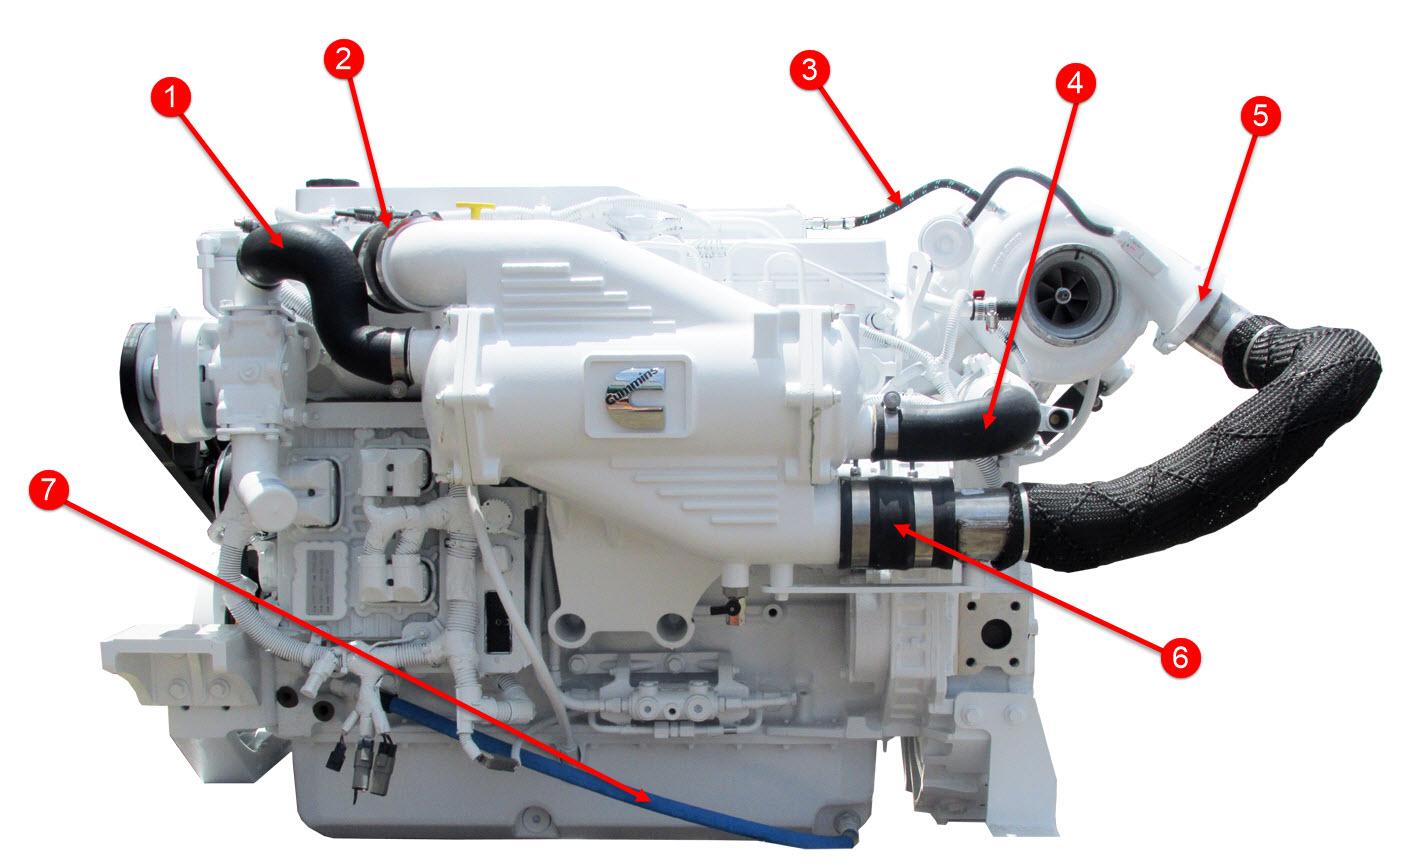 QSB 67 Engine Hoses  Seaboard Marine